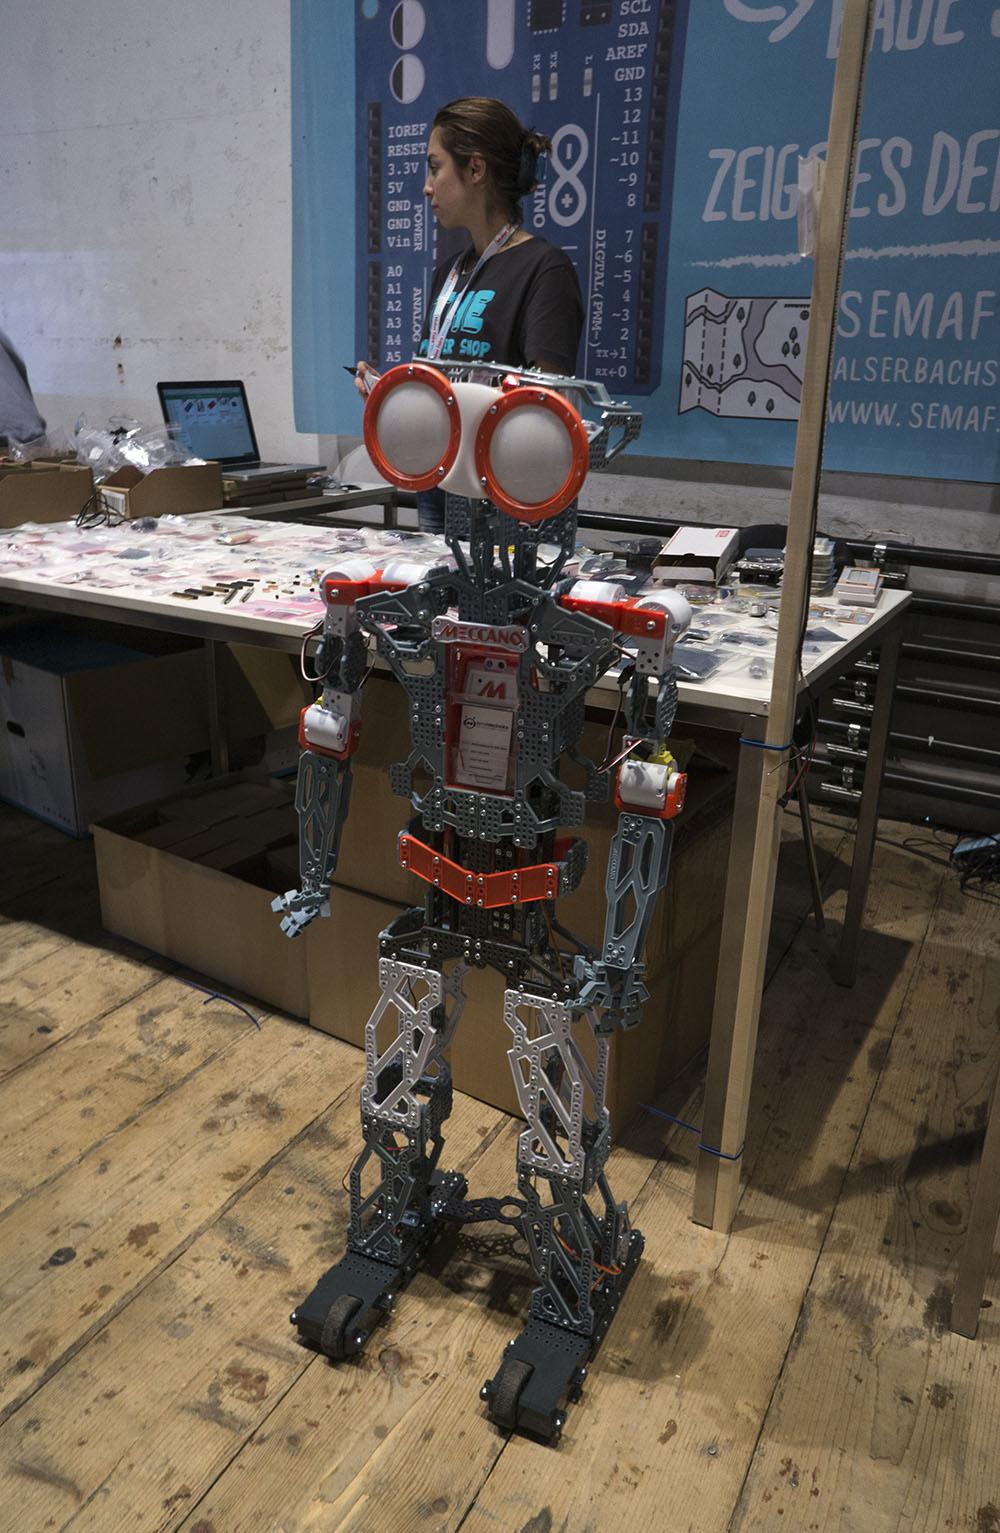 Maker_Fair_Vienna_Tvar_3D_tlac_3D_printing_01